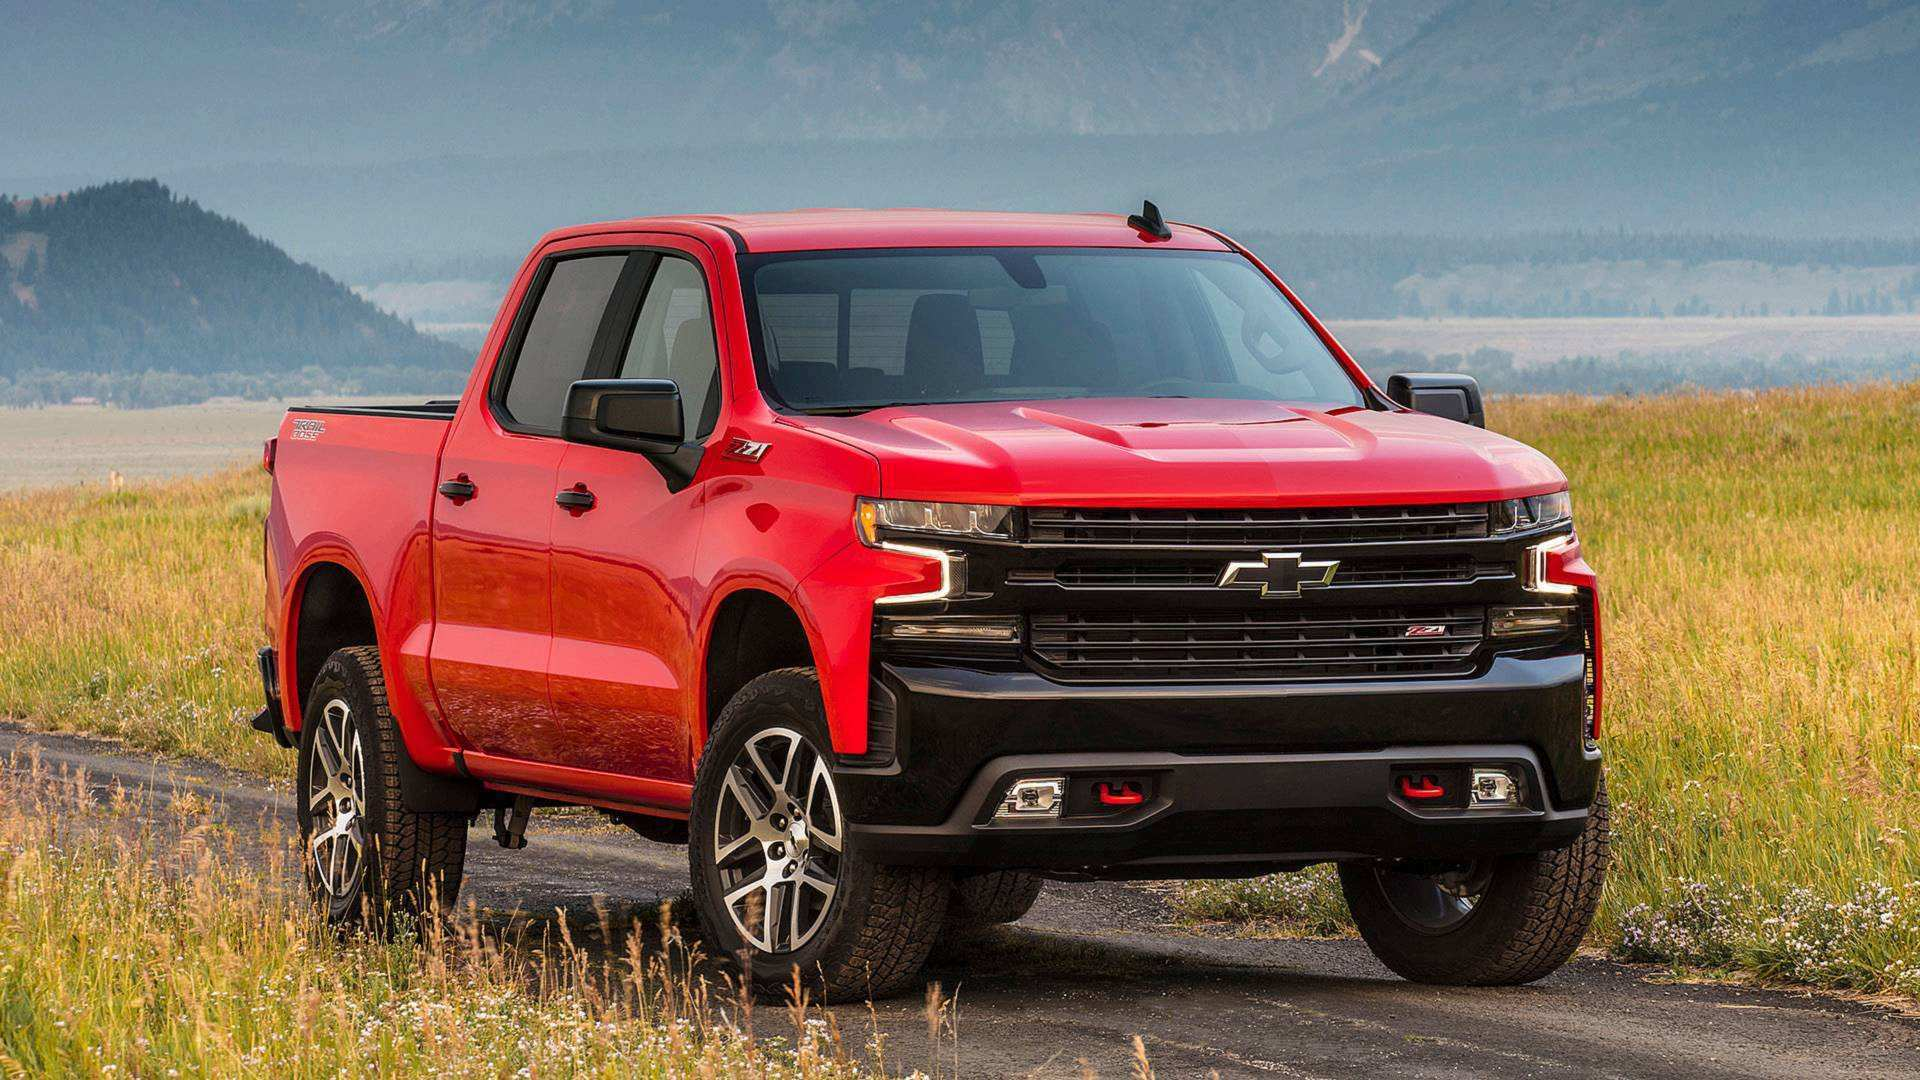 91 All New 2019 Chevrolet Pickup Release for 2019 Chevrolet Pickup